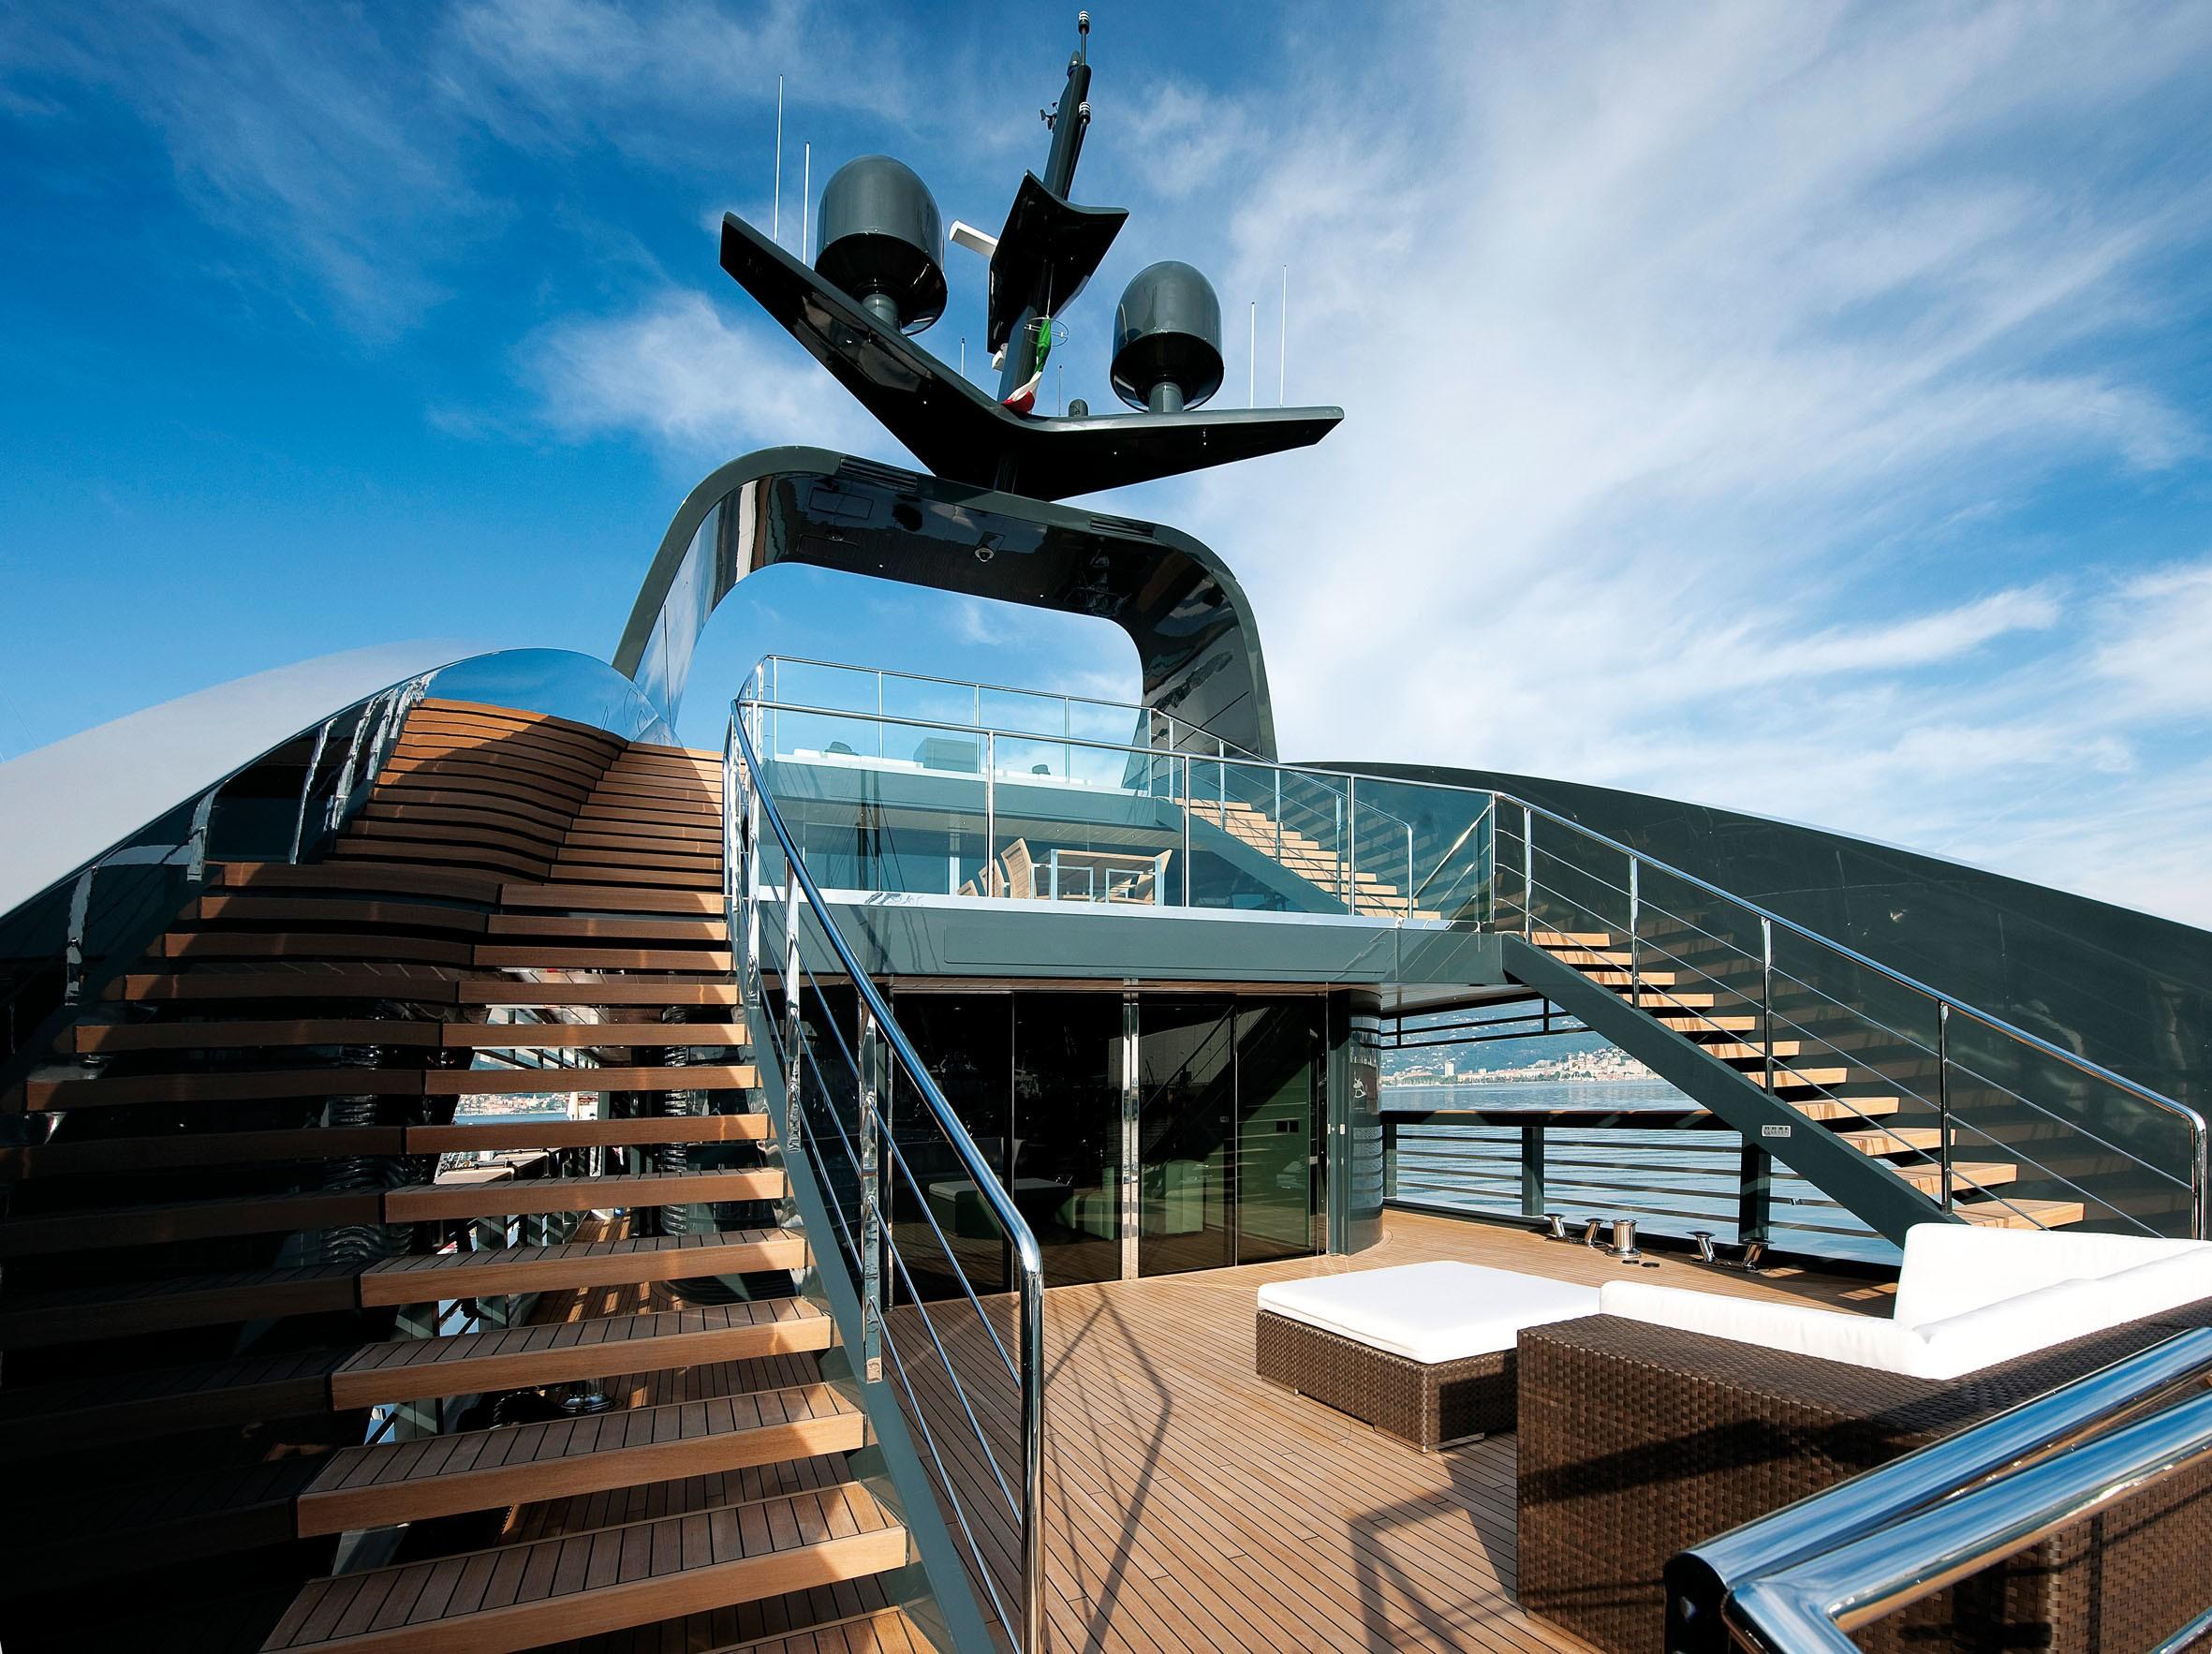 Top Deck Aboard Yacht OCEAN SAPPHIRE